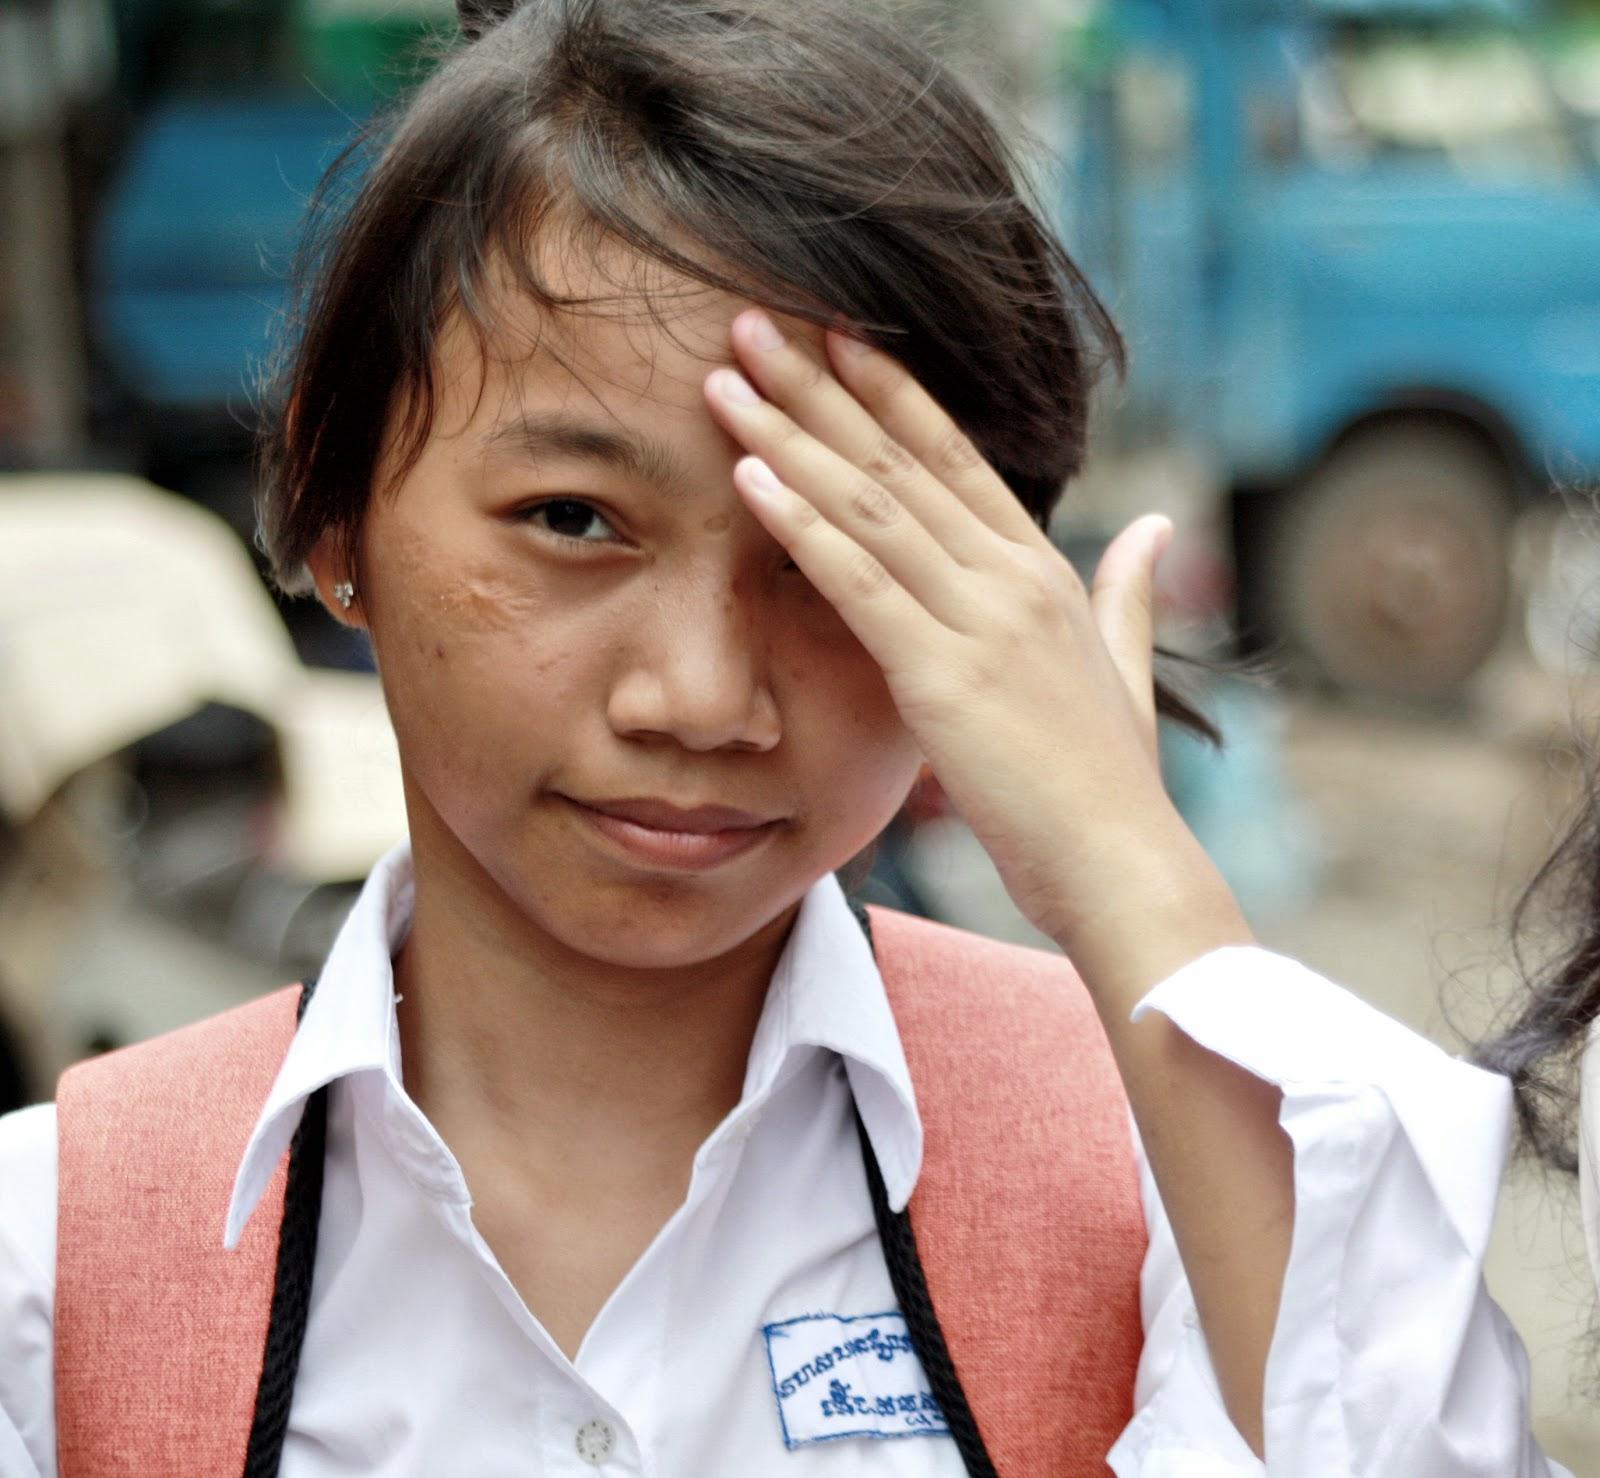 Cambodge, production vidéo, presse, filmmaker, documentaires, documentaries, Christophe Gargiulo, Kampuchéa, Cambodge Mag, magazine, Tonle Sap, articles, nouvelles, video production, Cambodia, KiamProd, KiamProd photography, KiamProd movies, revues de presse, vietnam, thaïlande, birmanie, Myanmar, Lao, Laos, Burma, Chine, China. photographies, visages khmers, khmer faces, market, marché, Phnom Penh,